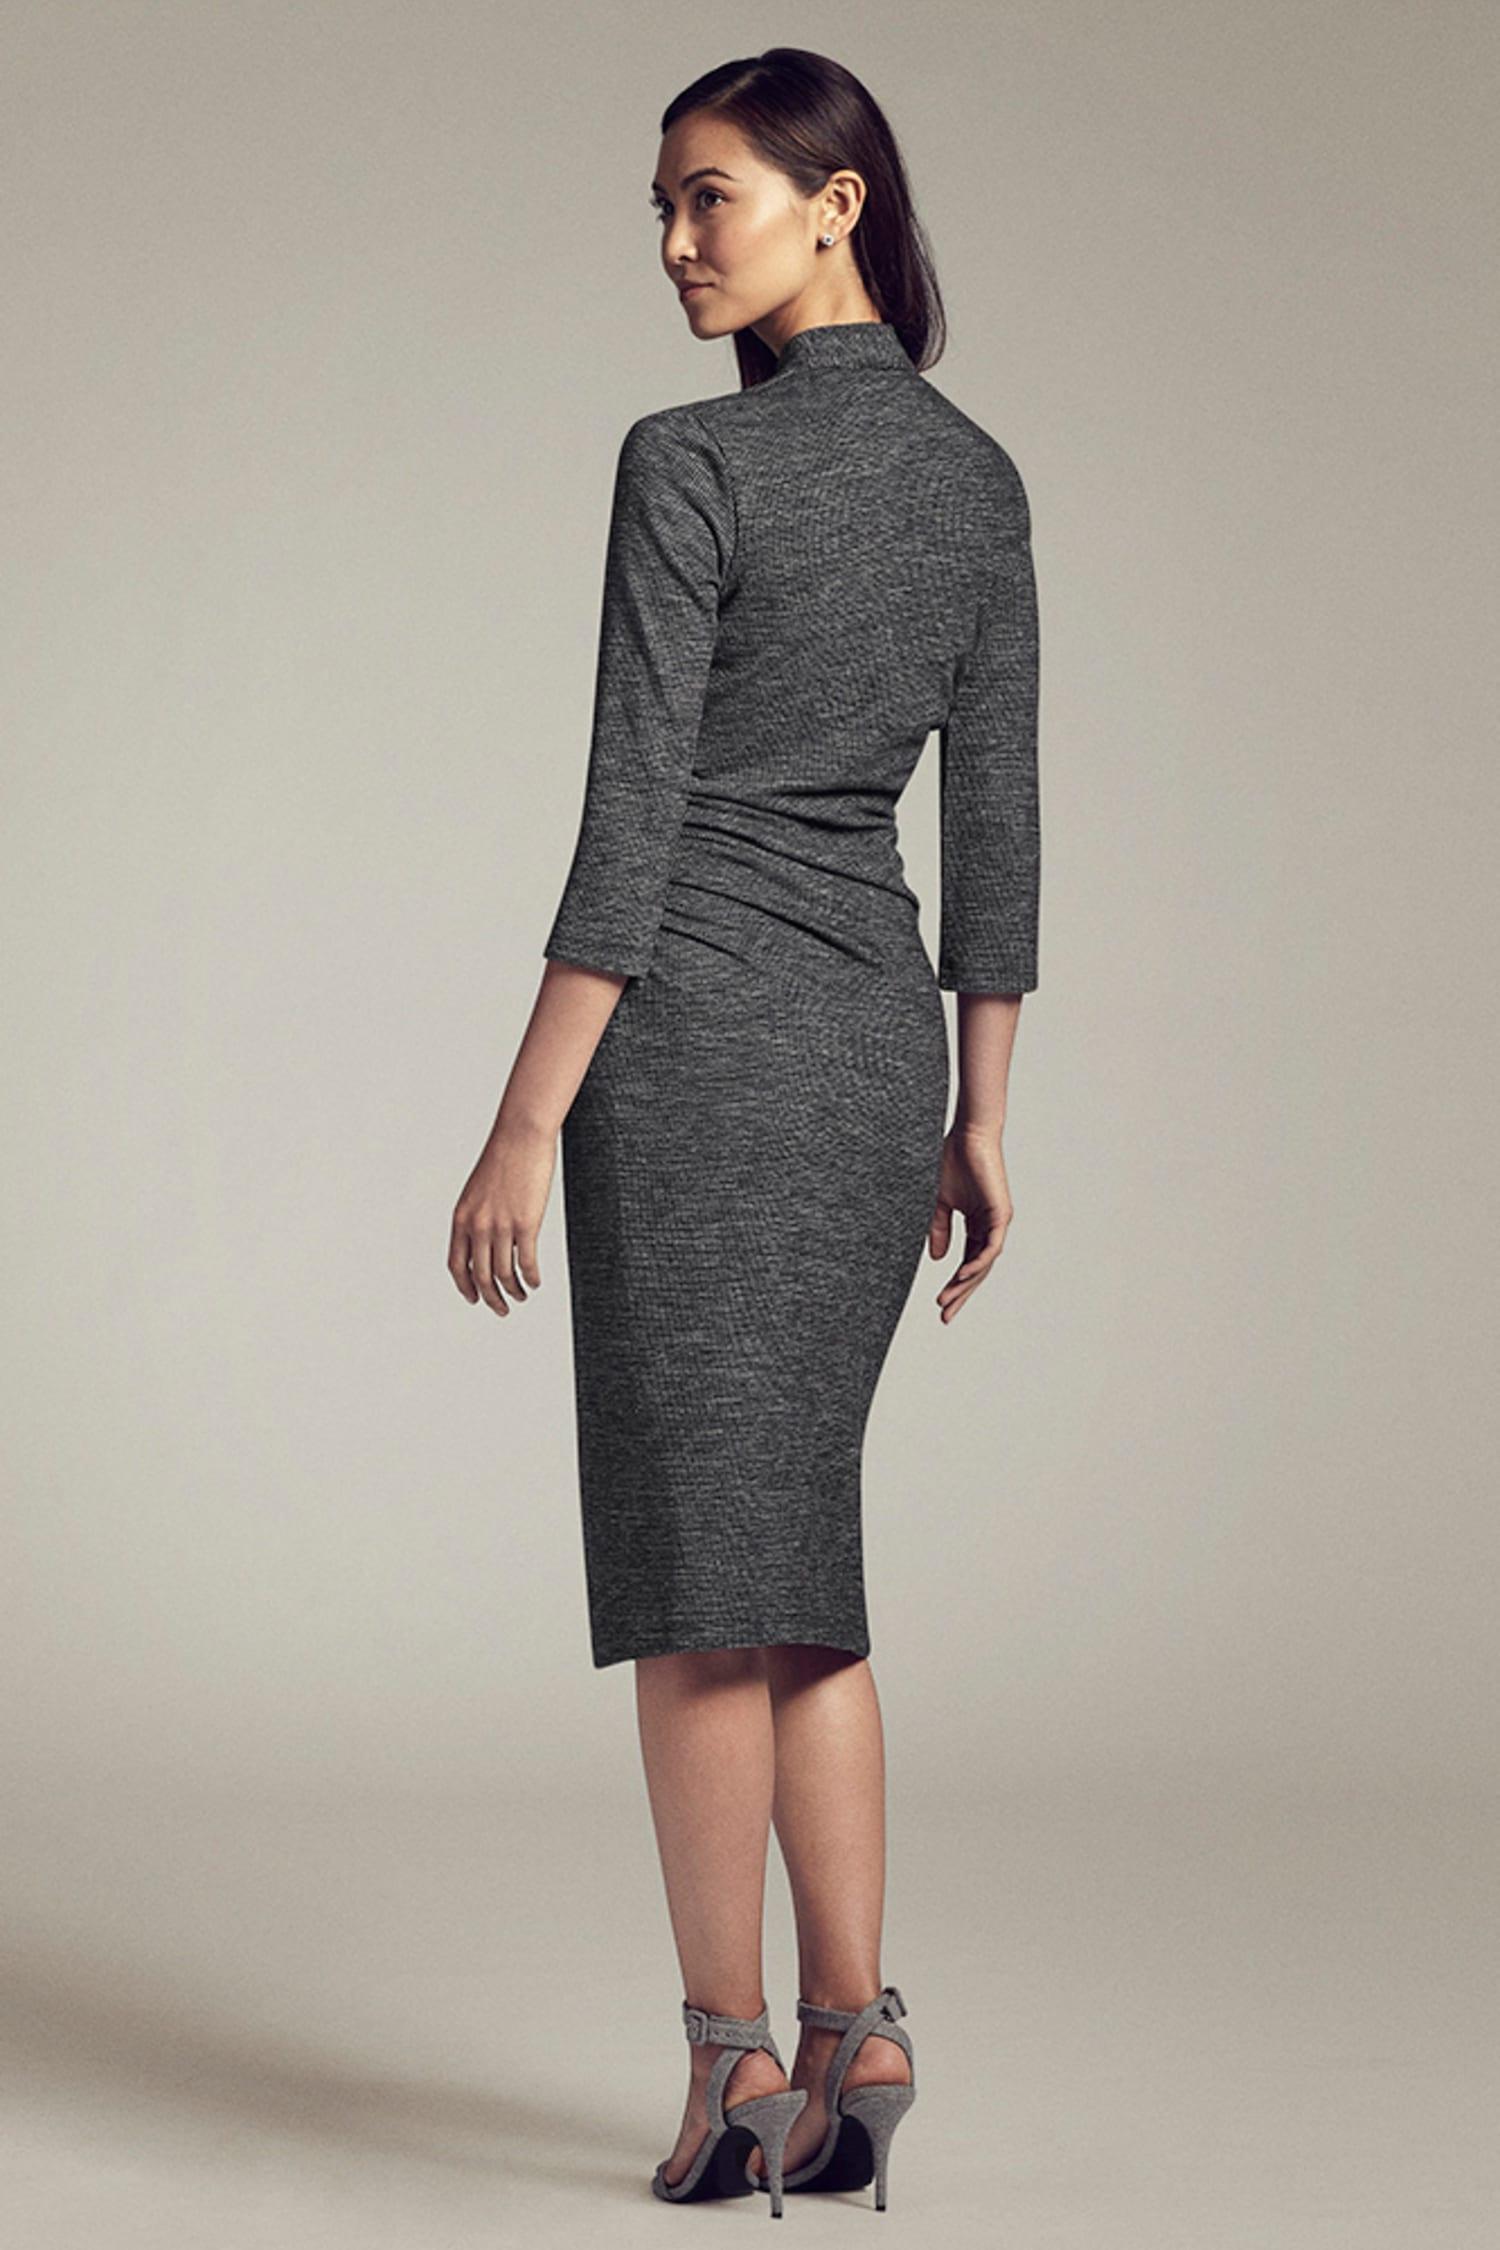 fd7f7a51ab2 Casey Dress—Mini Houndstooth    Gray   Black 4